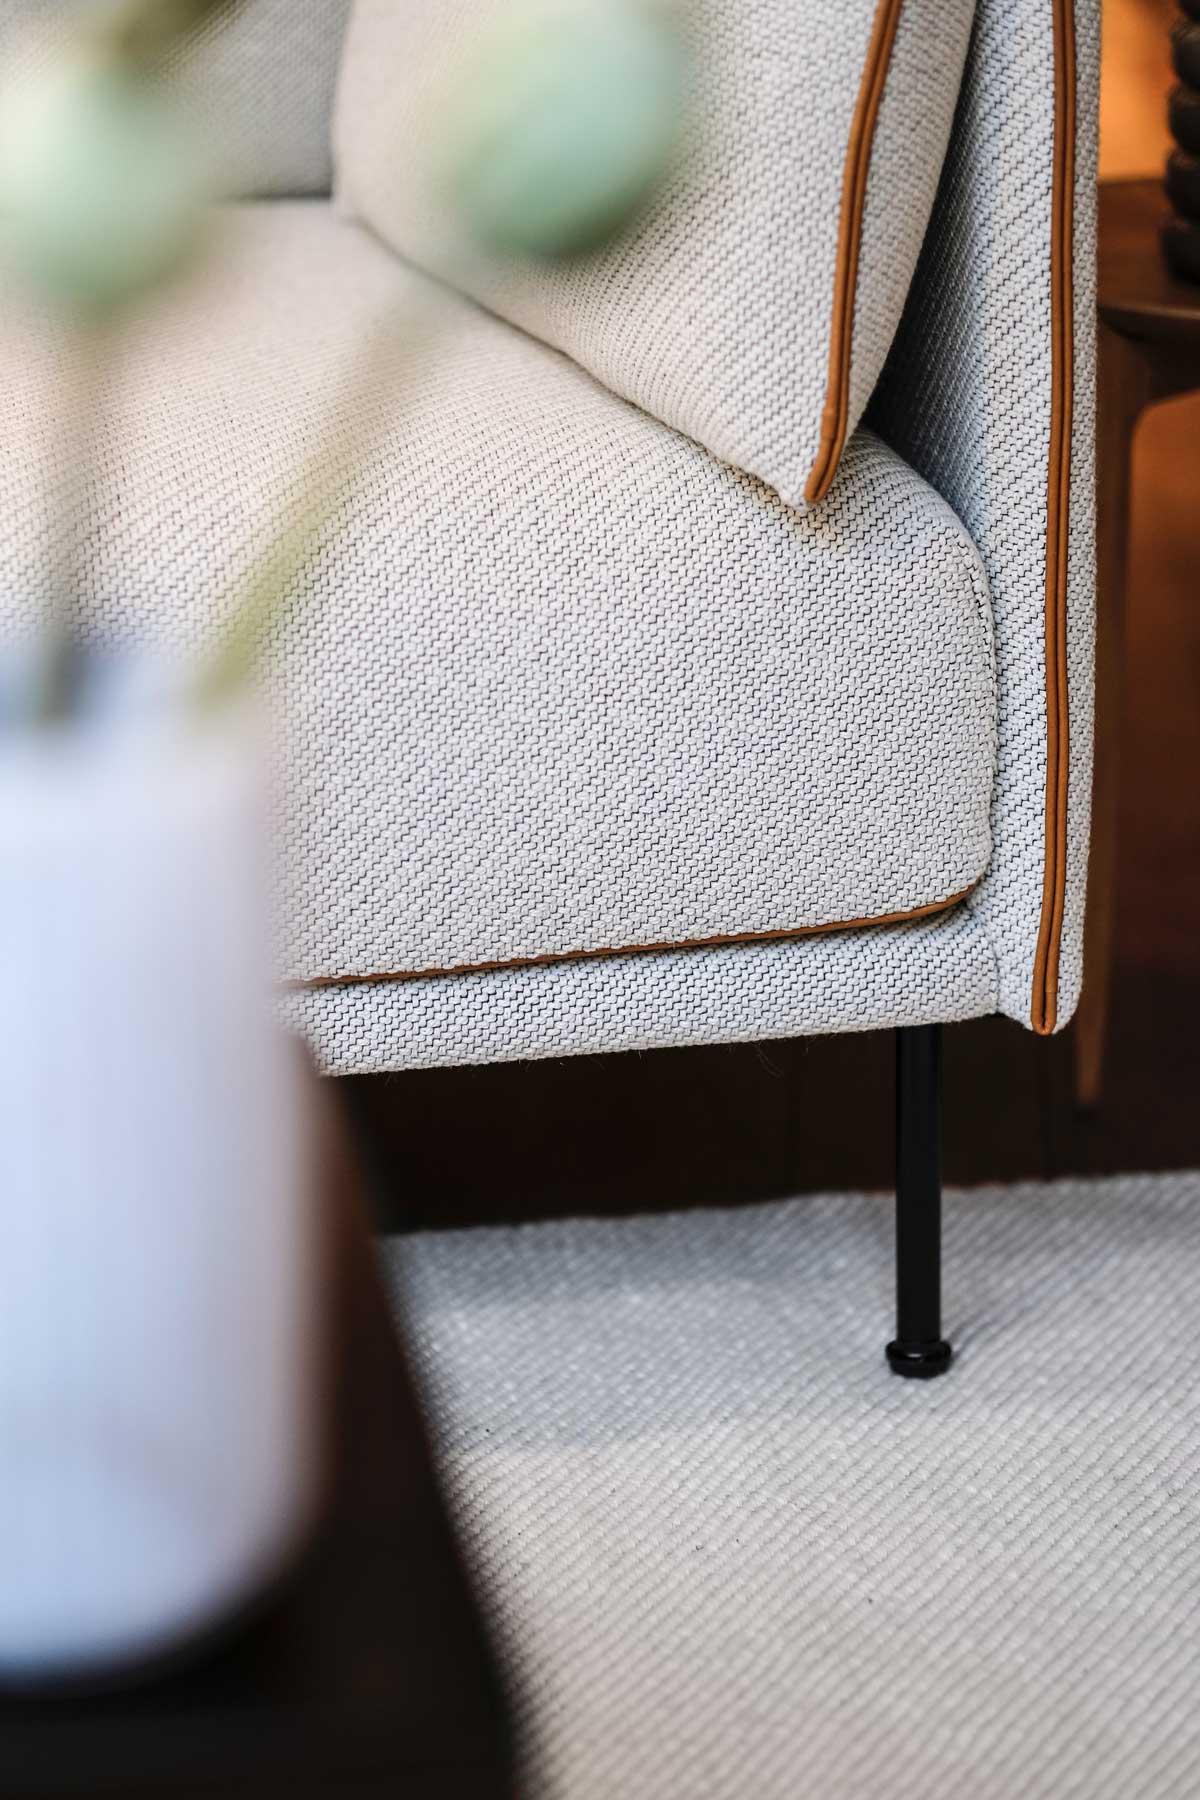 HAY Silhouette Soffa med cognacfärgad piping